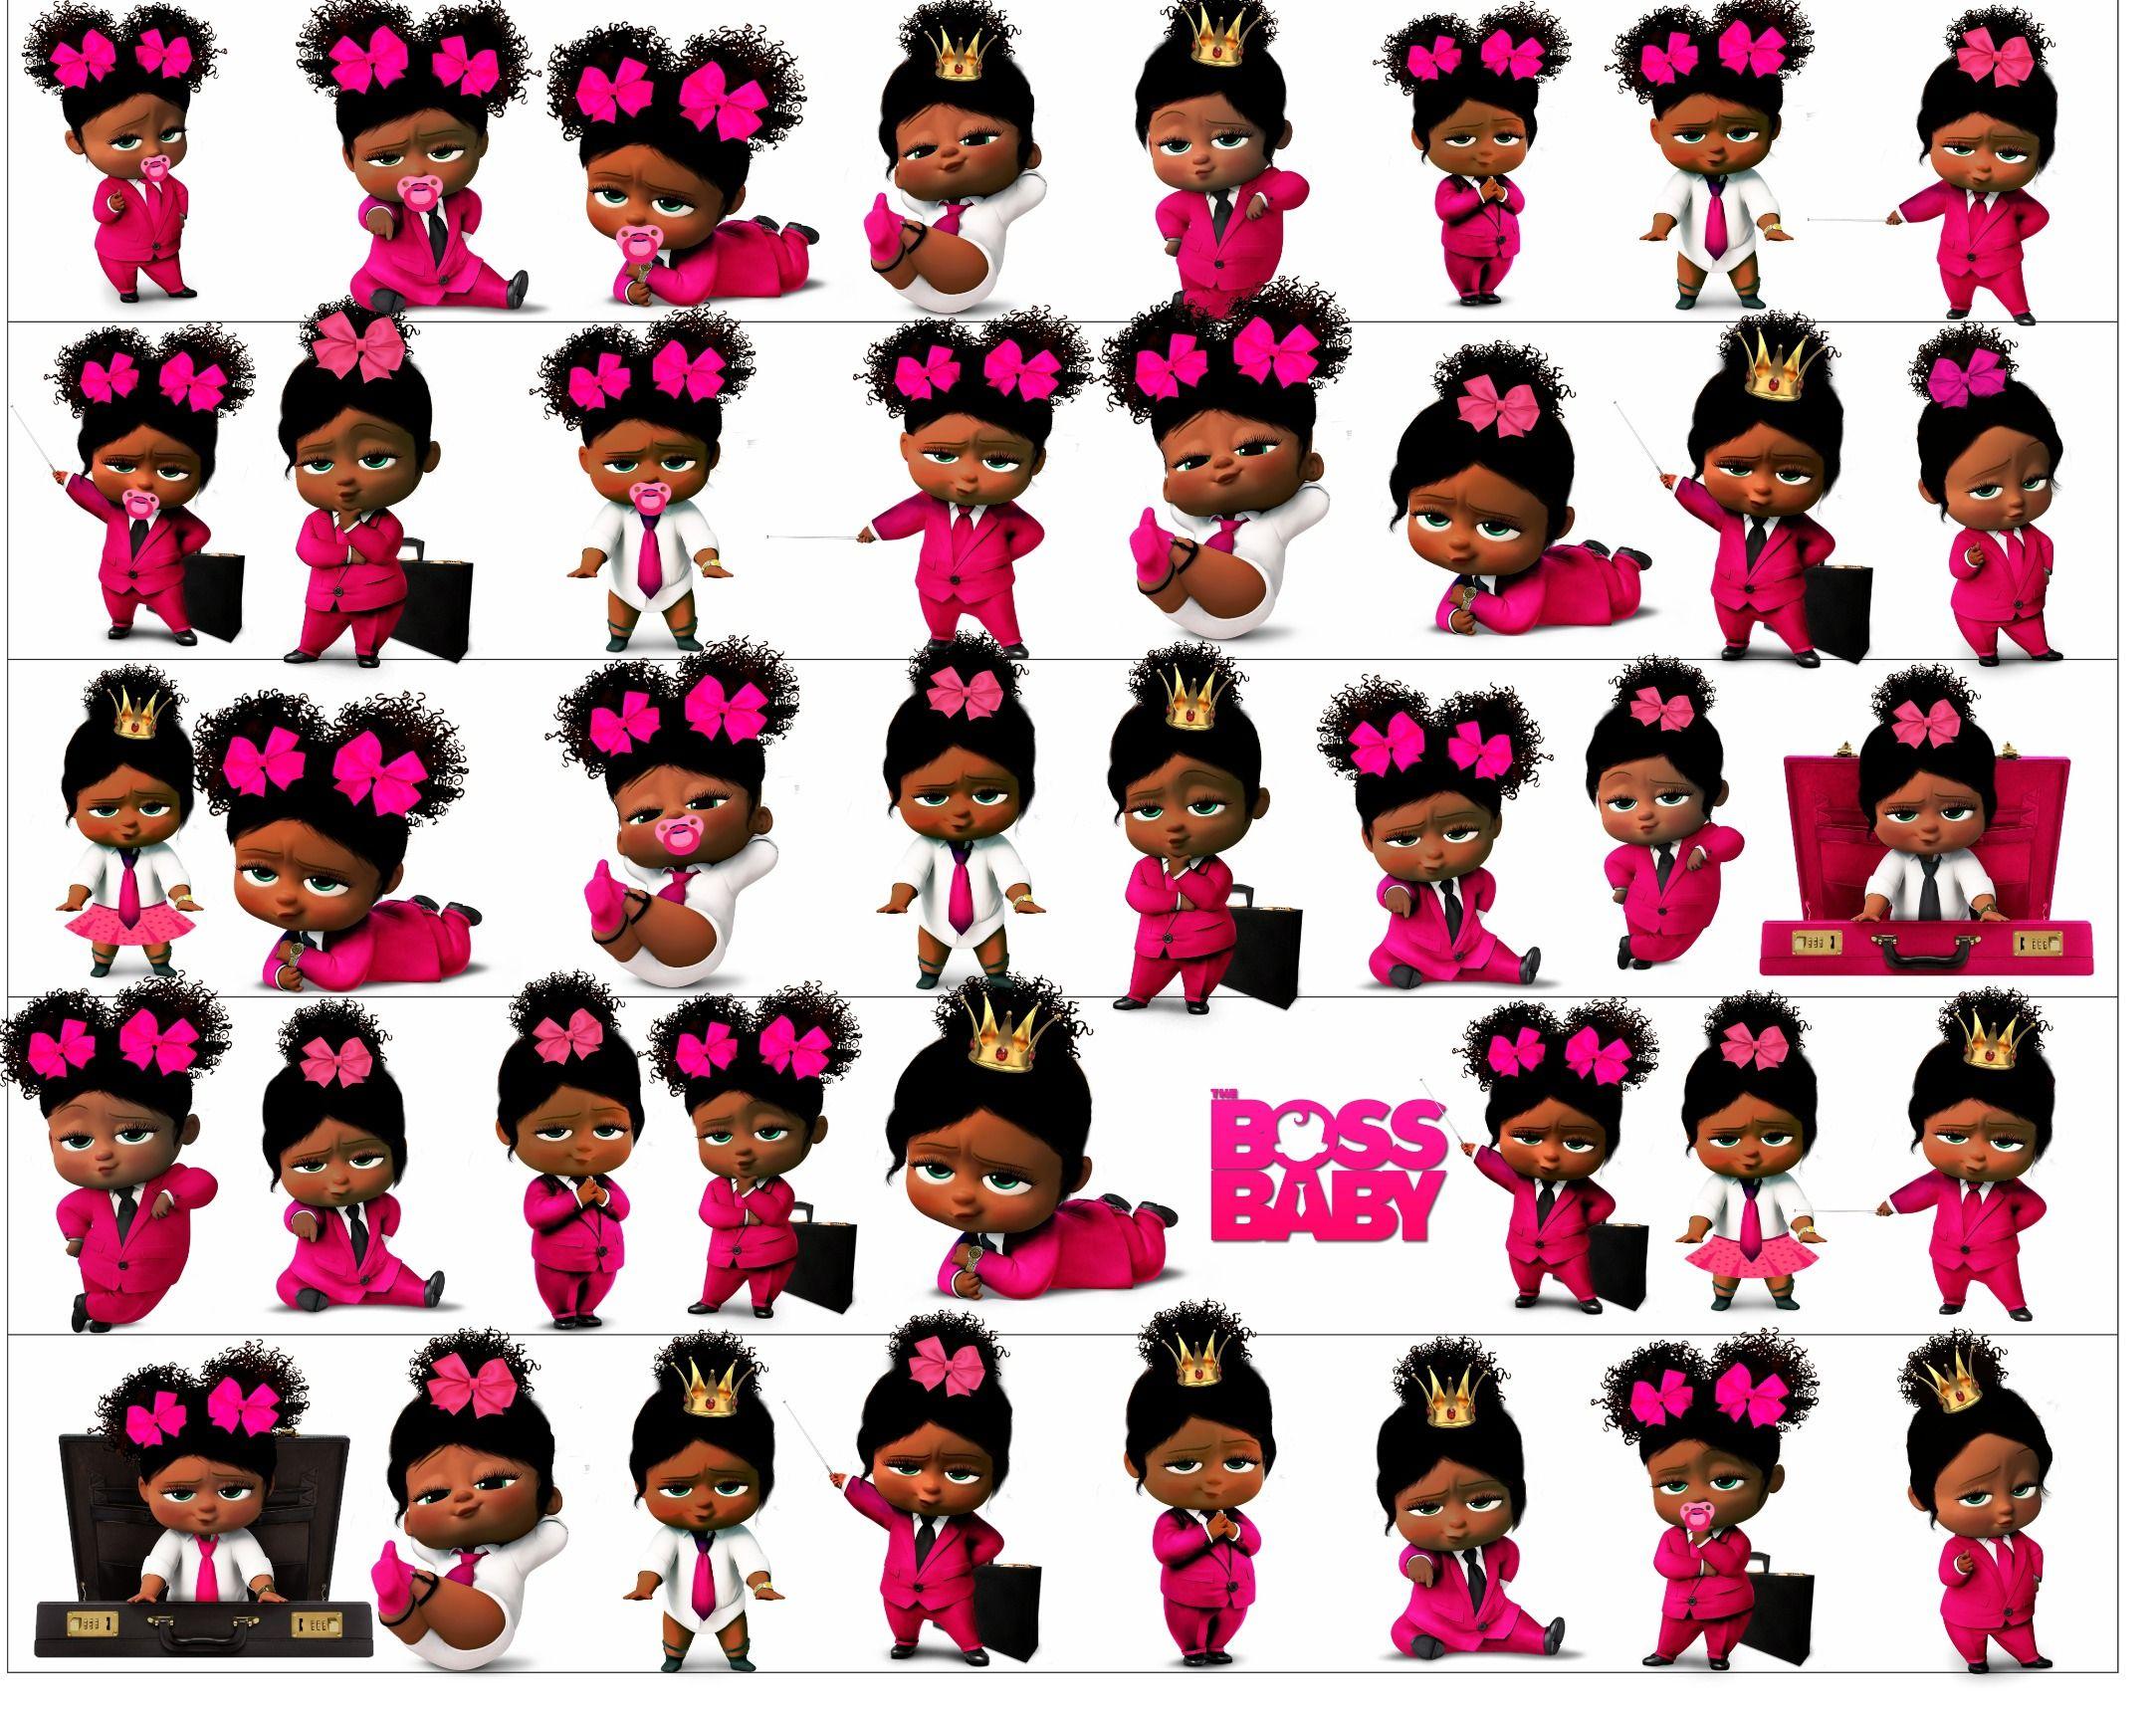 African American Girl Boss Baby Clipart, Boss Baby Girl.